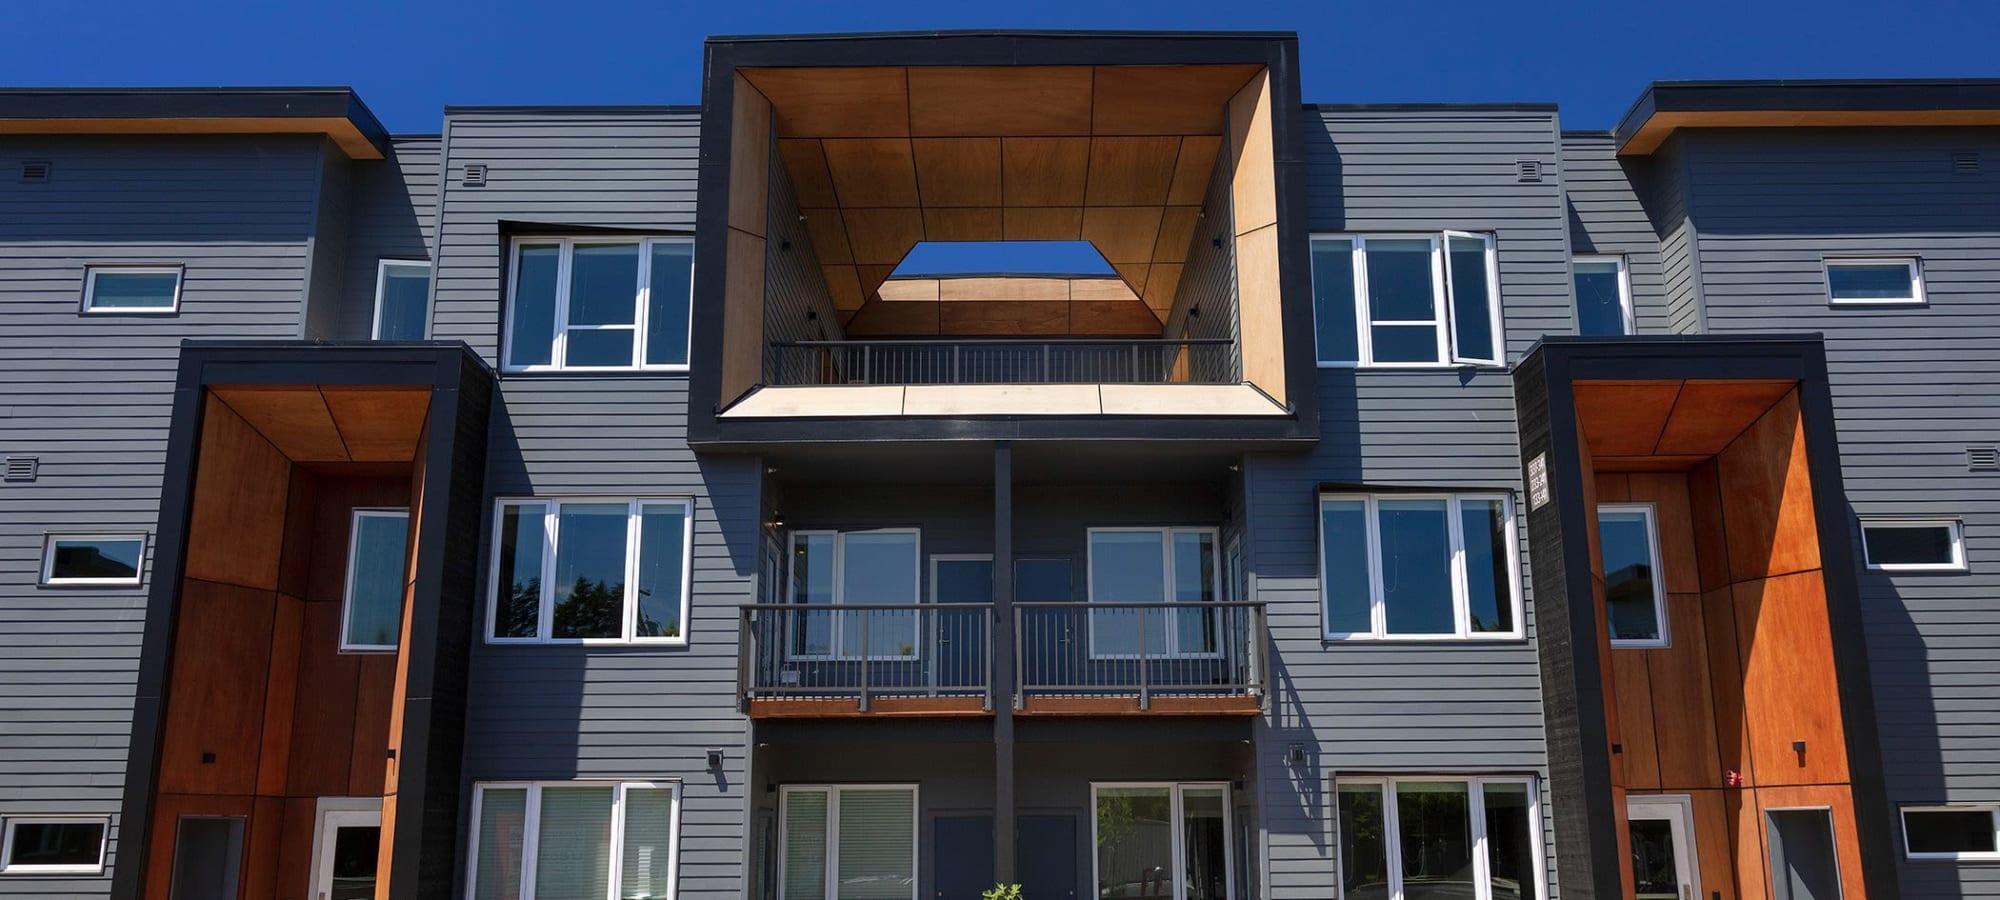 Apartments at Brookside Apartments in Gresham, Oregon